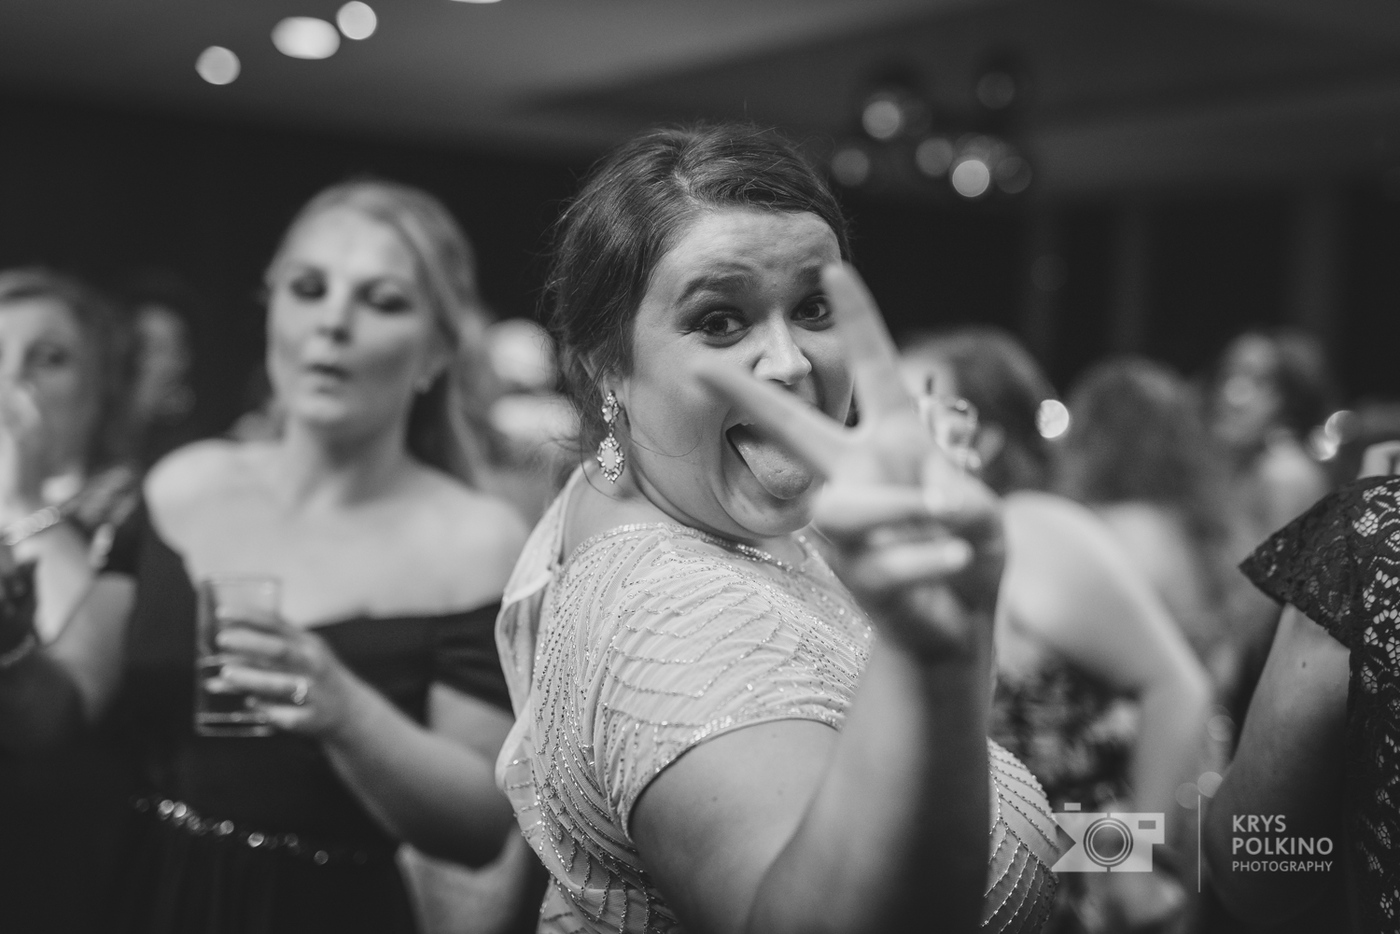 Graduation Ball 2016 - Crown Plaza Hotel, Liverpool.